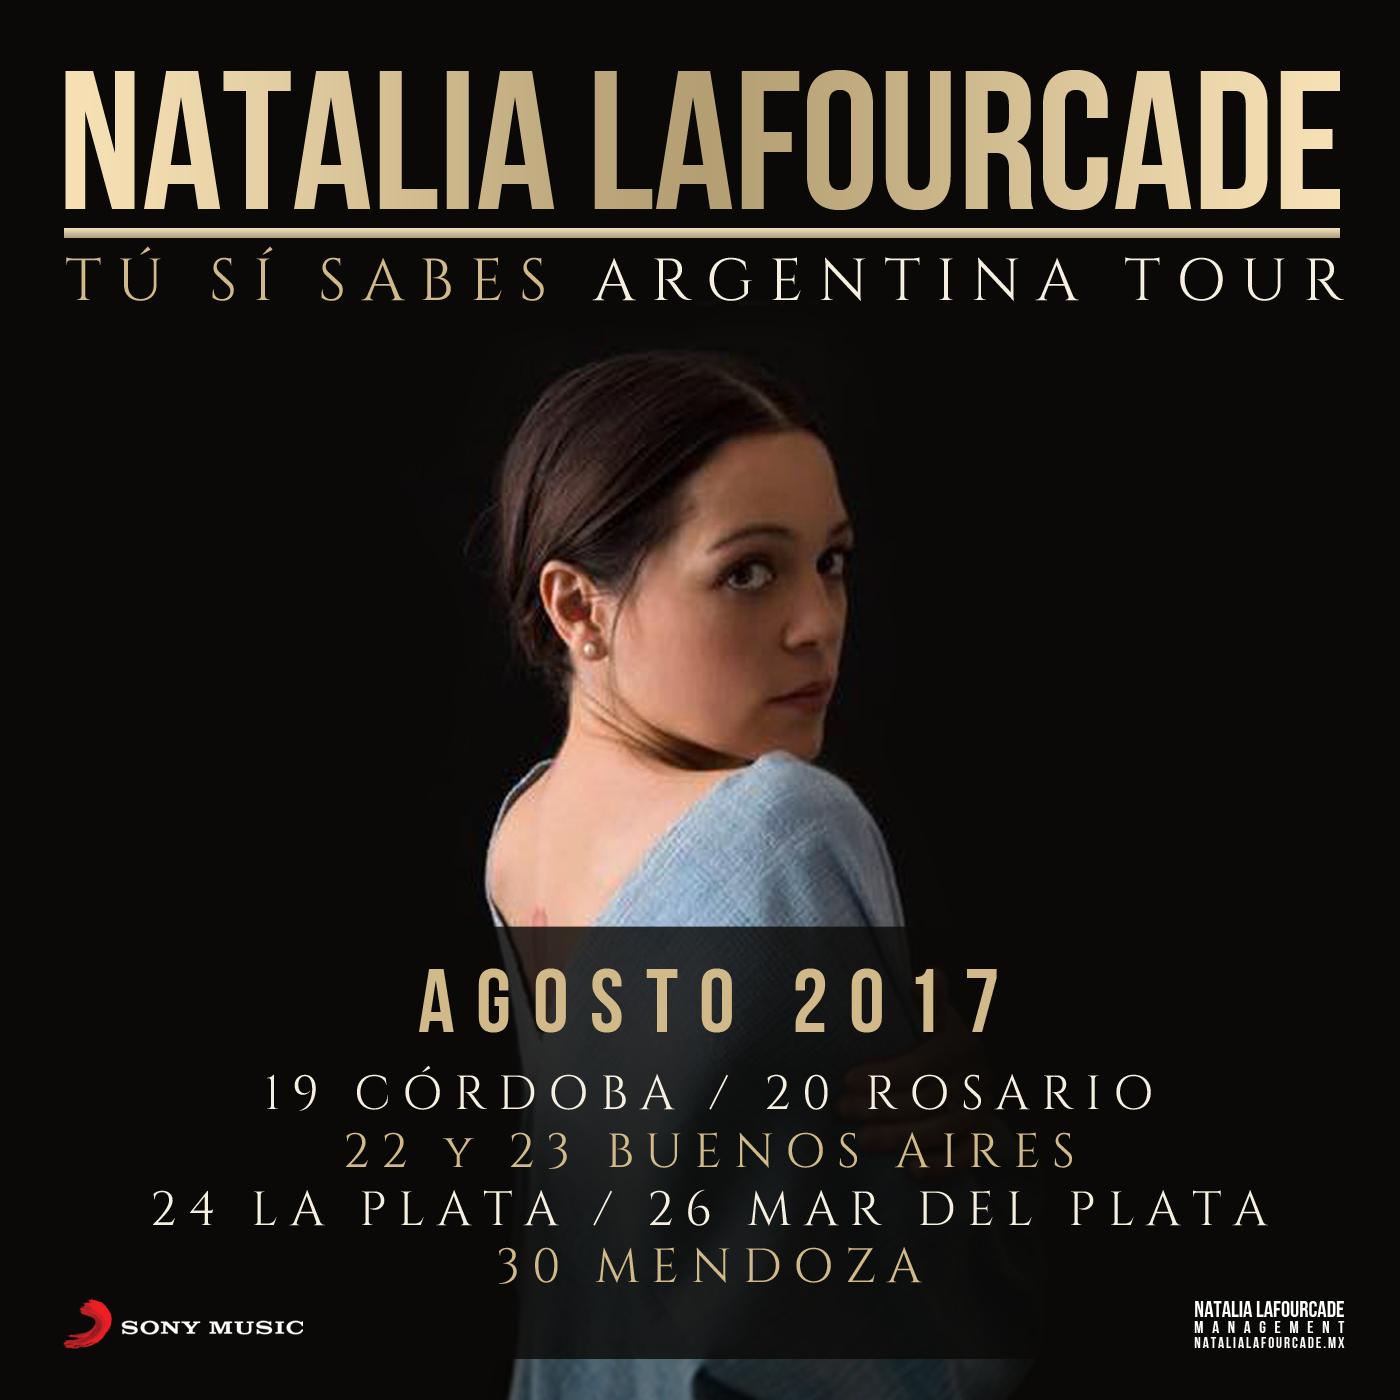 natalia-lafourcade-argentina-tour-2017-2